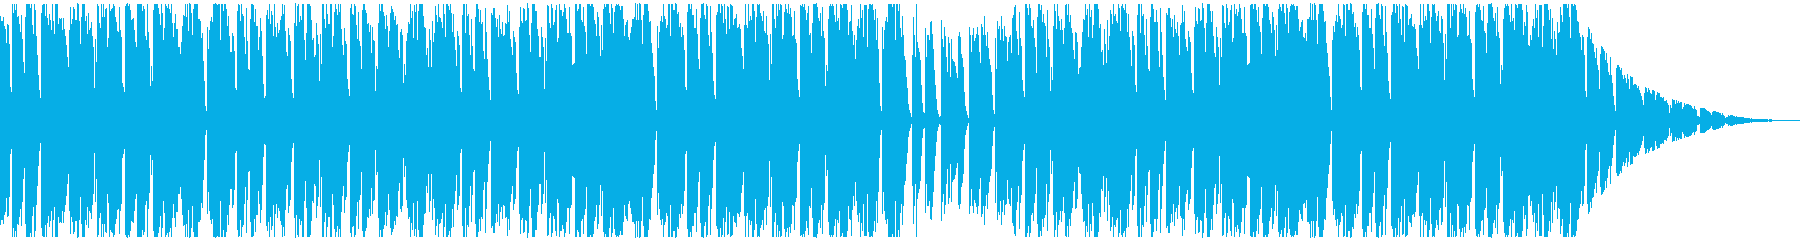 Melloy Lo-Fi Hip Hopの再生済みの波形